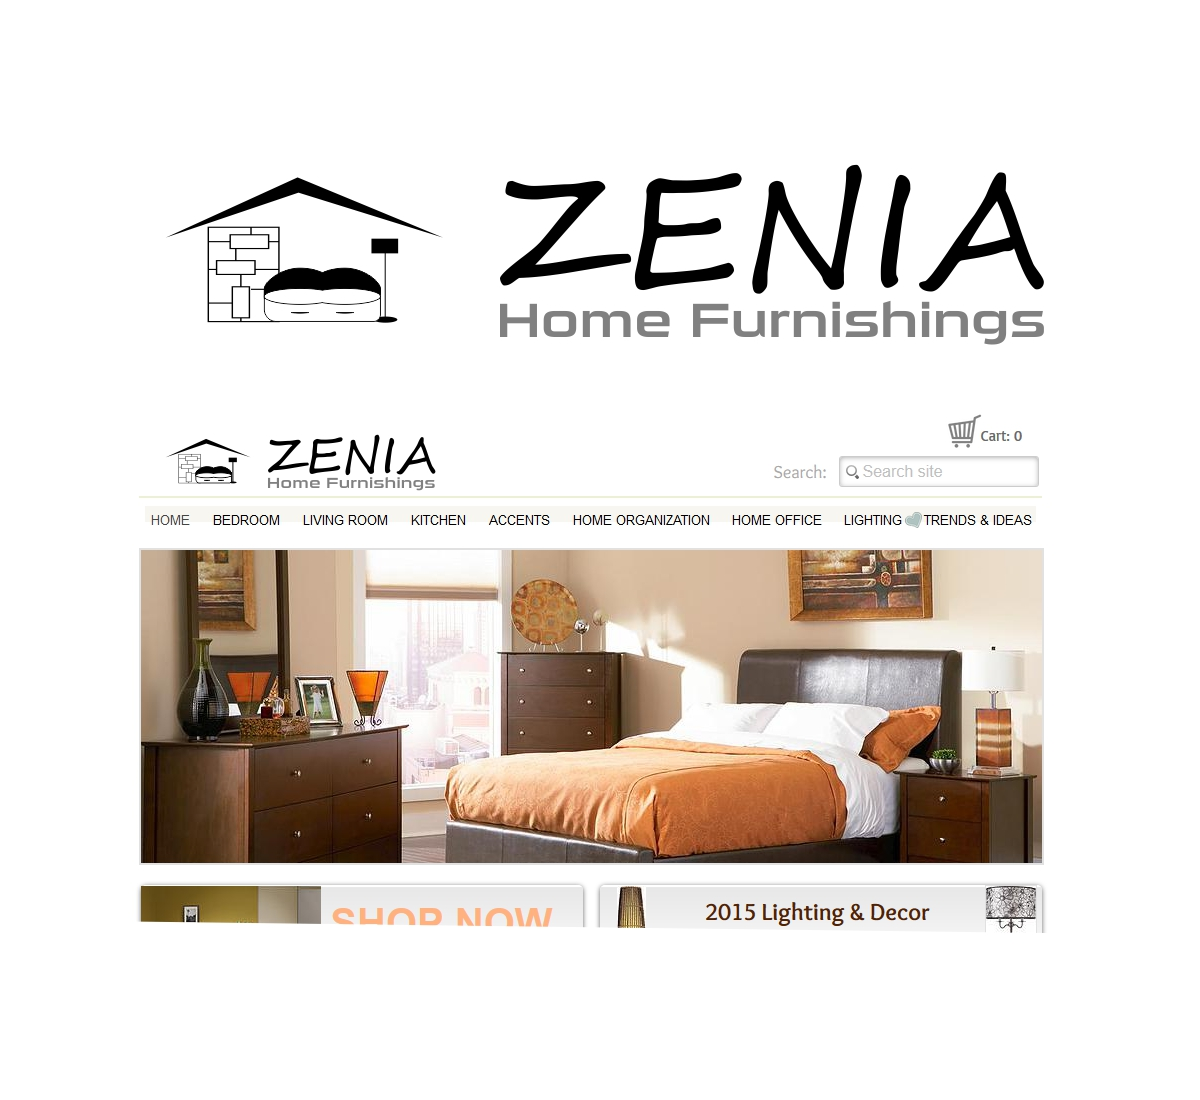 Business Logo Design For Zenia Or Zenia Home Furnishings By